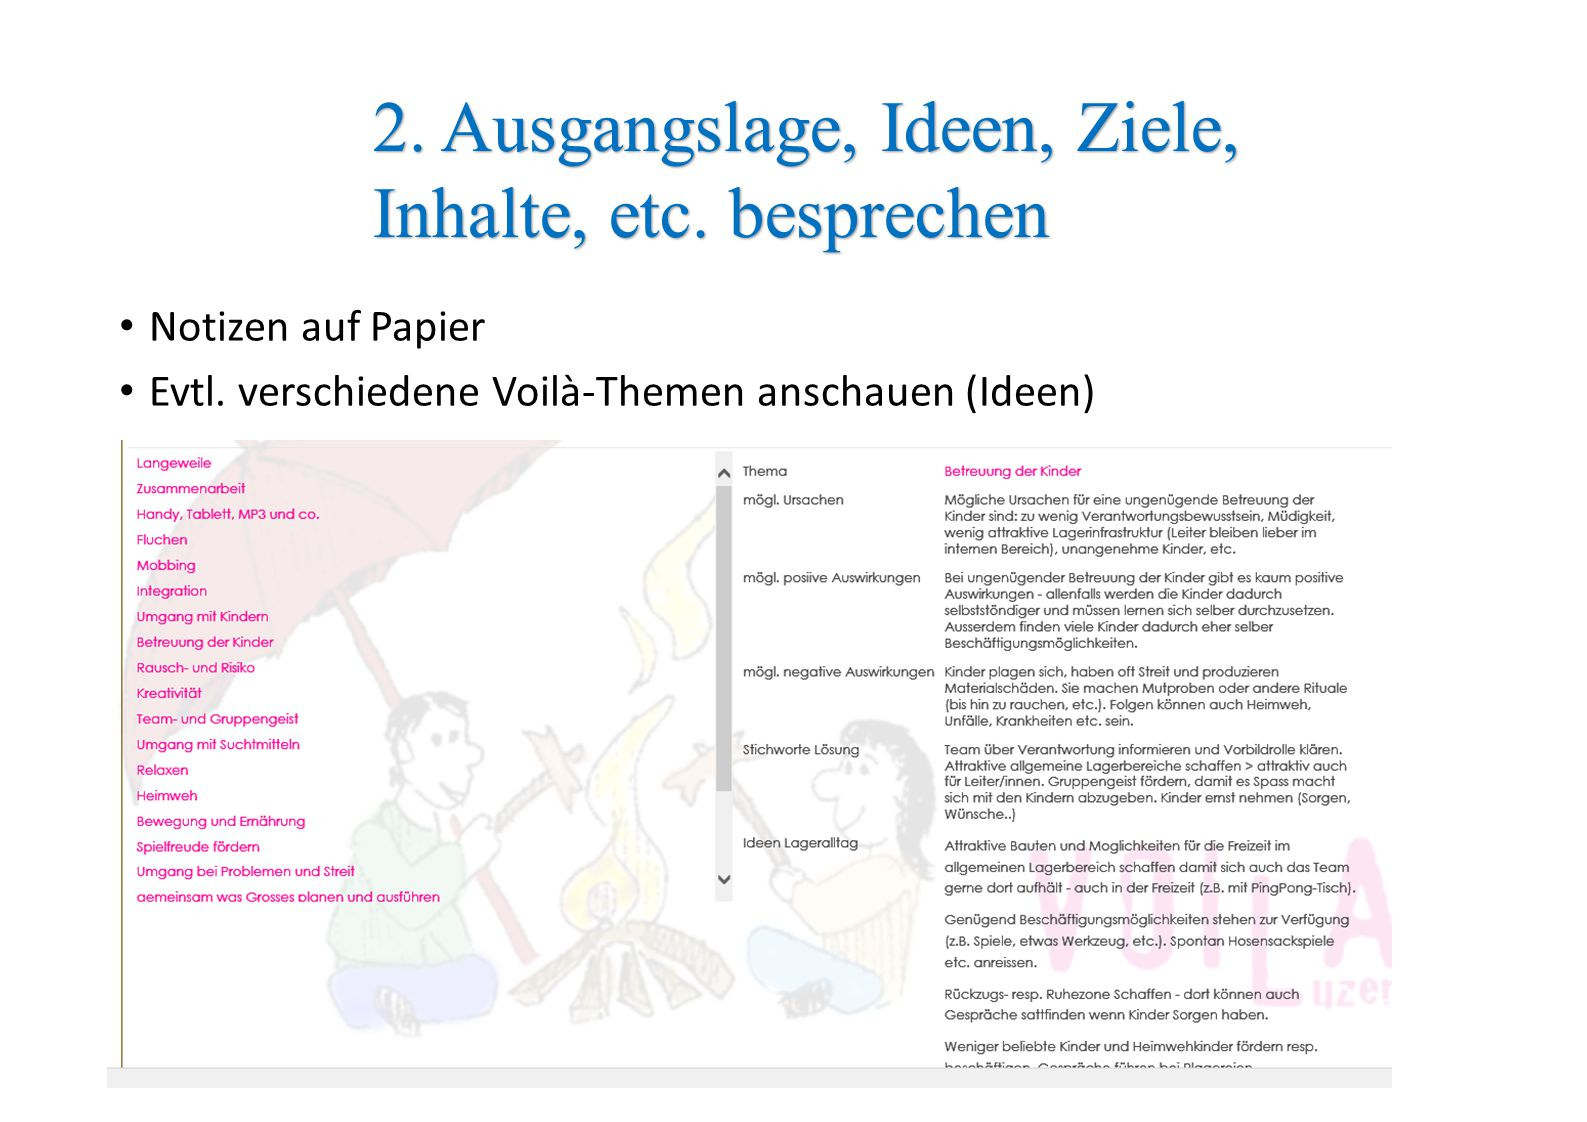 2. Ausgangslage, Ideen, Ziele, Inhalte, etc. besprechen